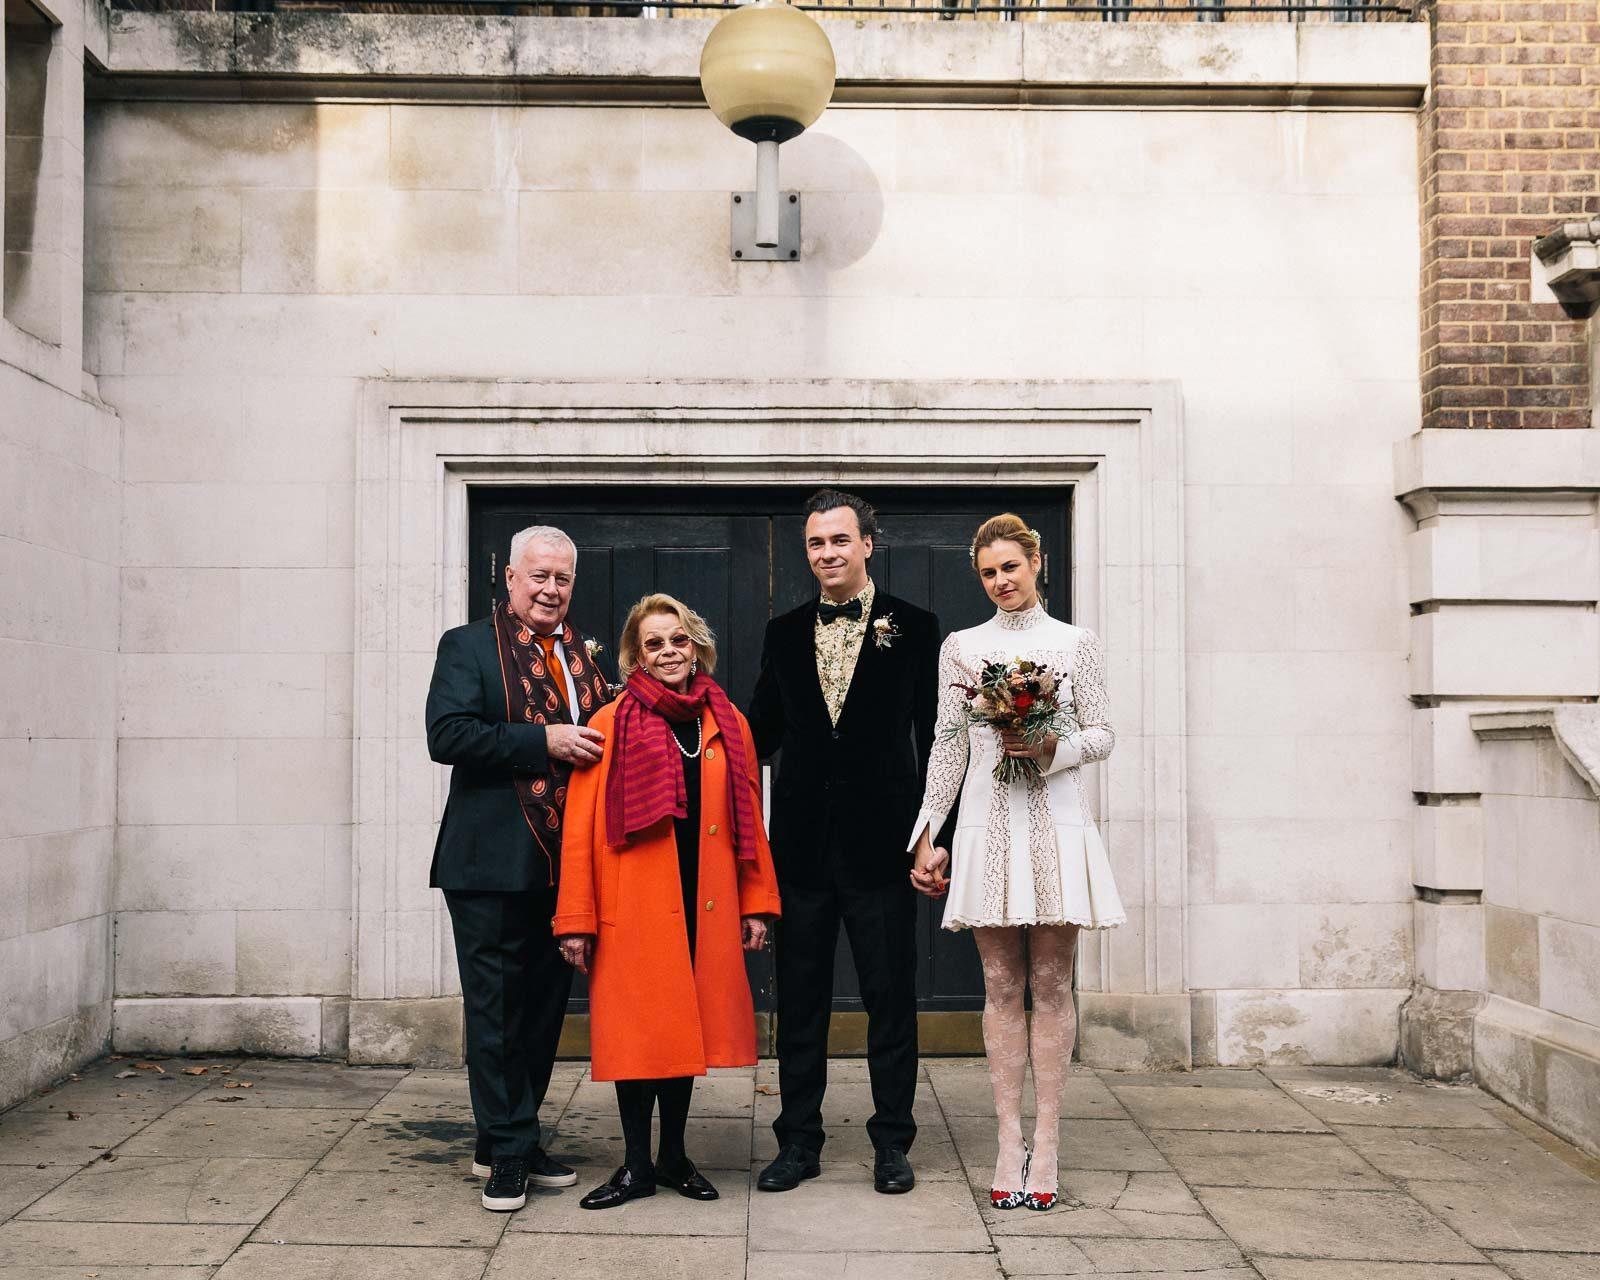 Islington_townhall_wedding-40